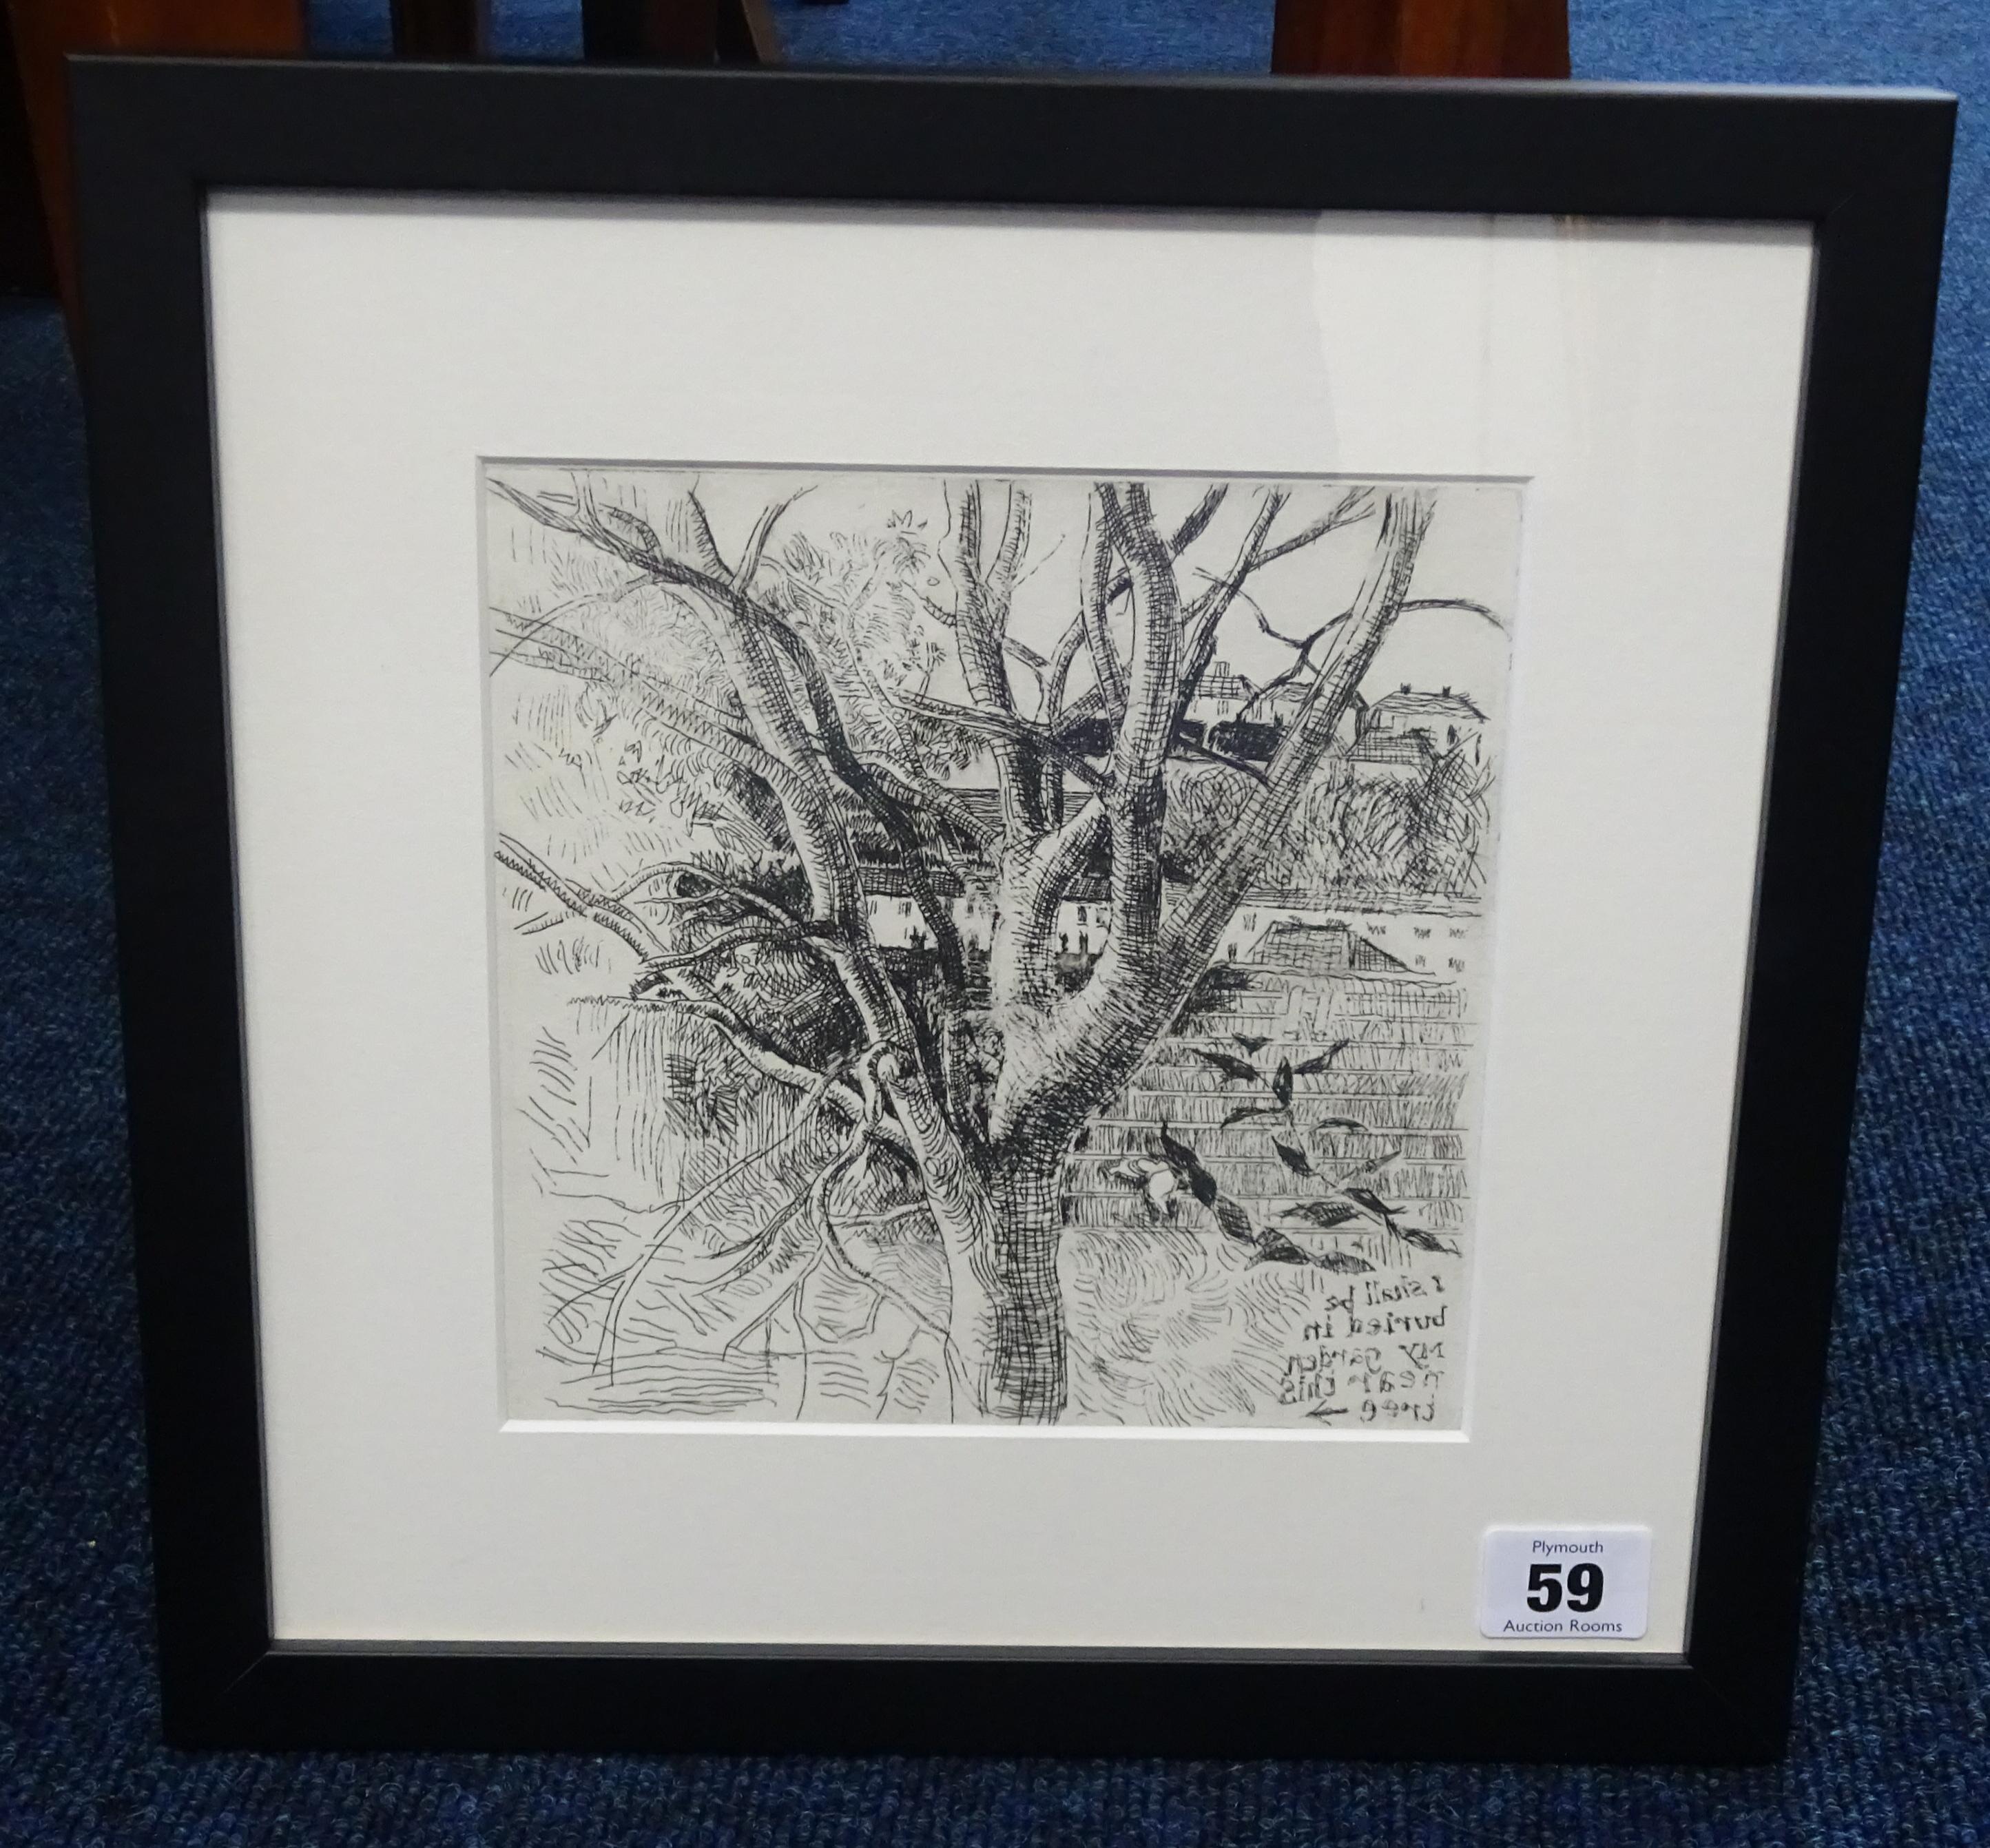 Lot 059 - Robert Lenkiewicz (1941-2002) 'Etching of trees', framed and glazed, 17cm x 17cm.